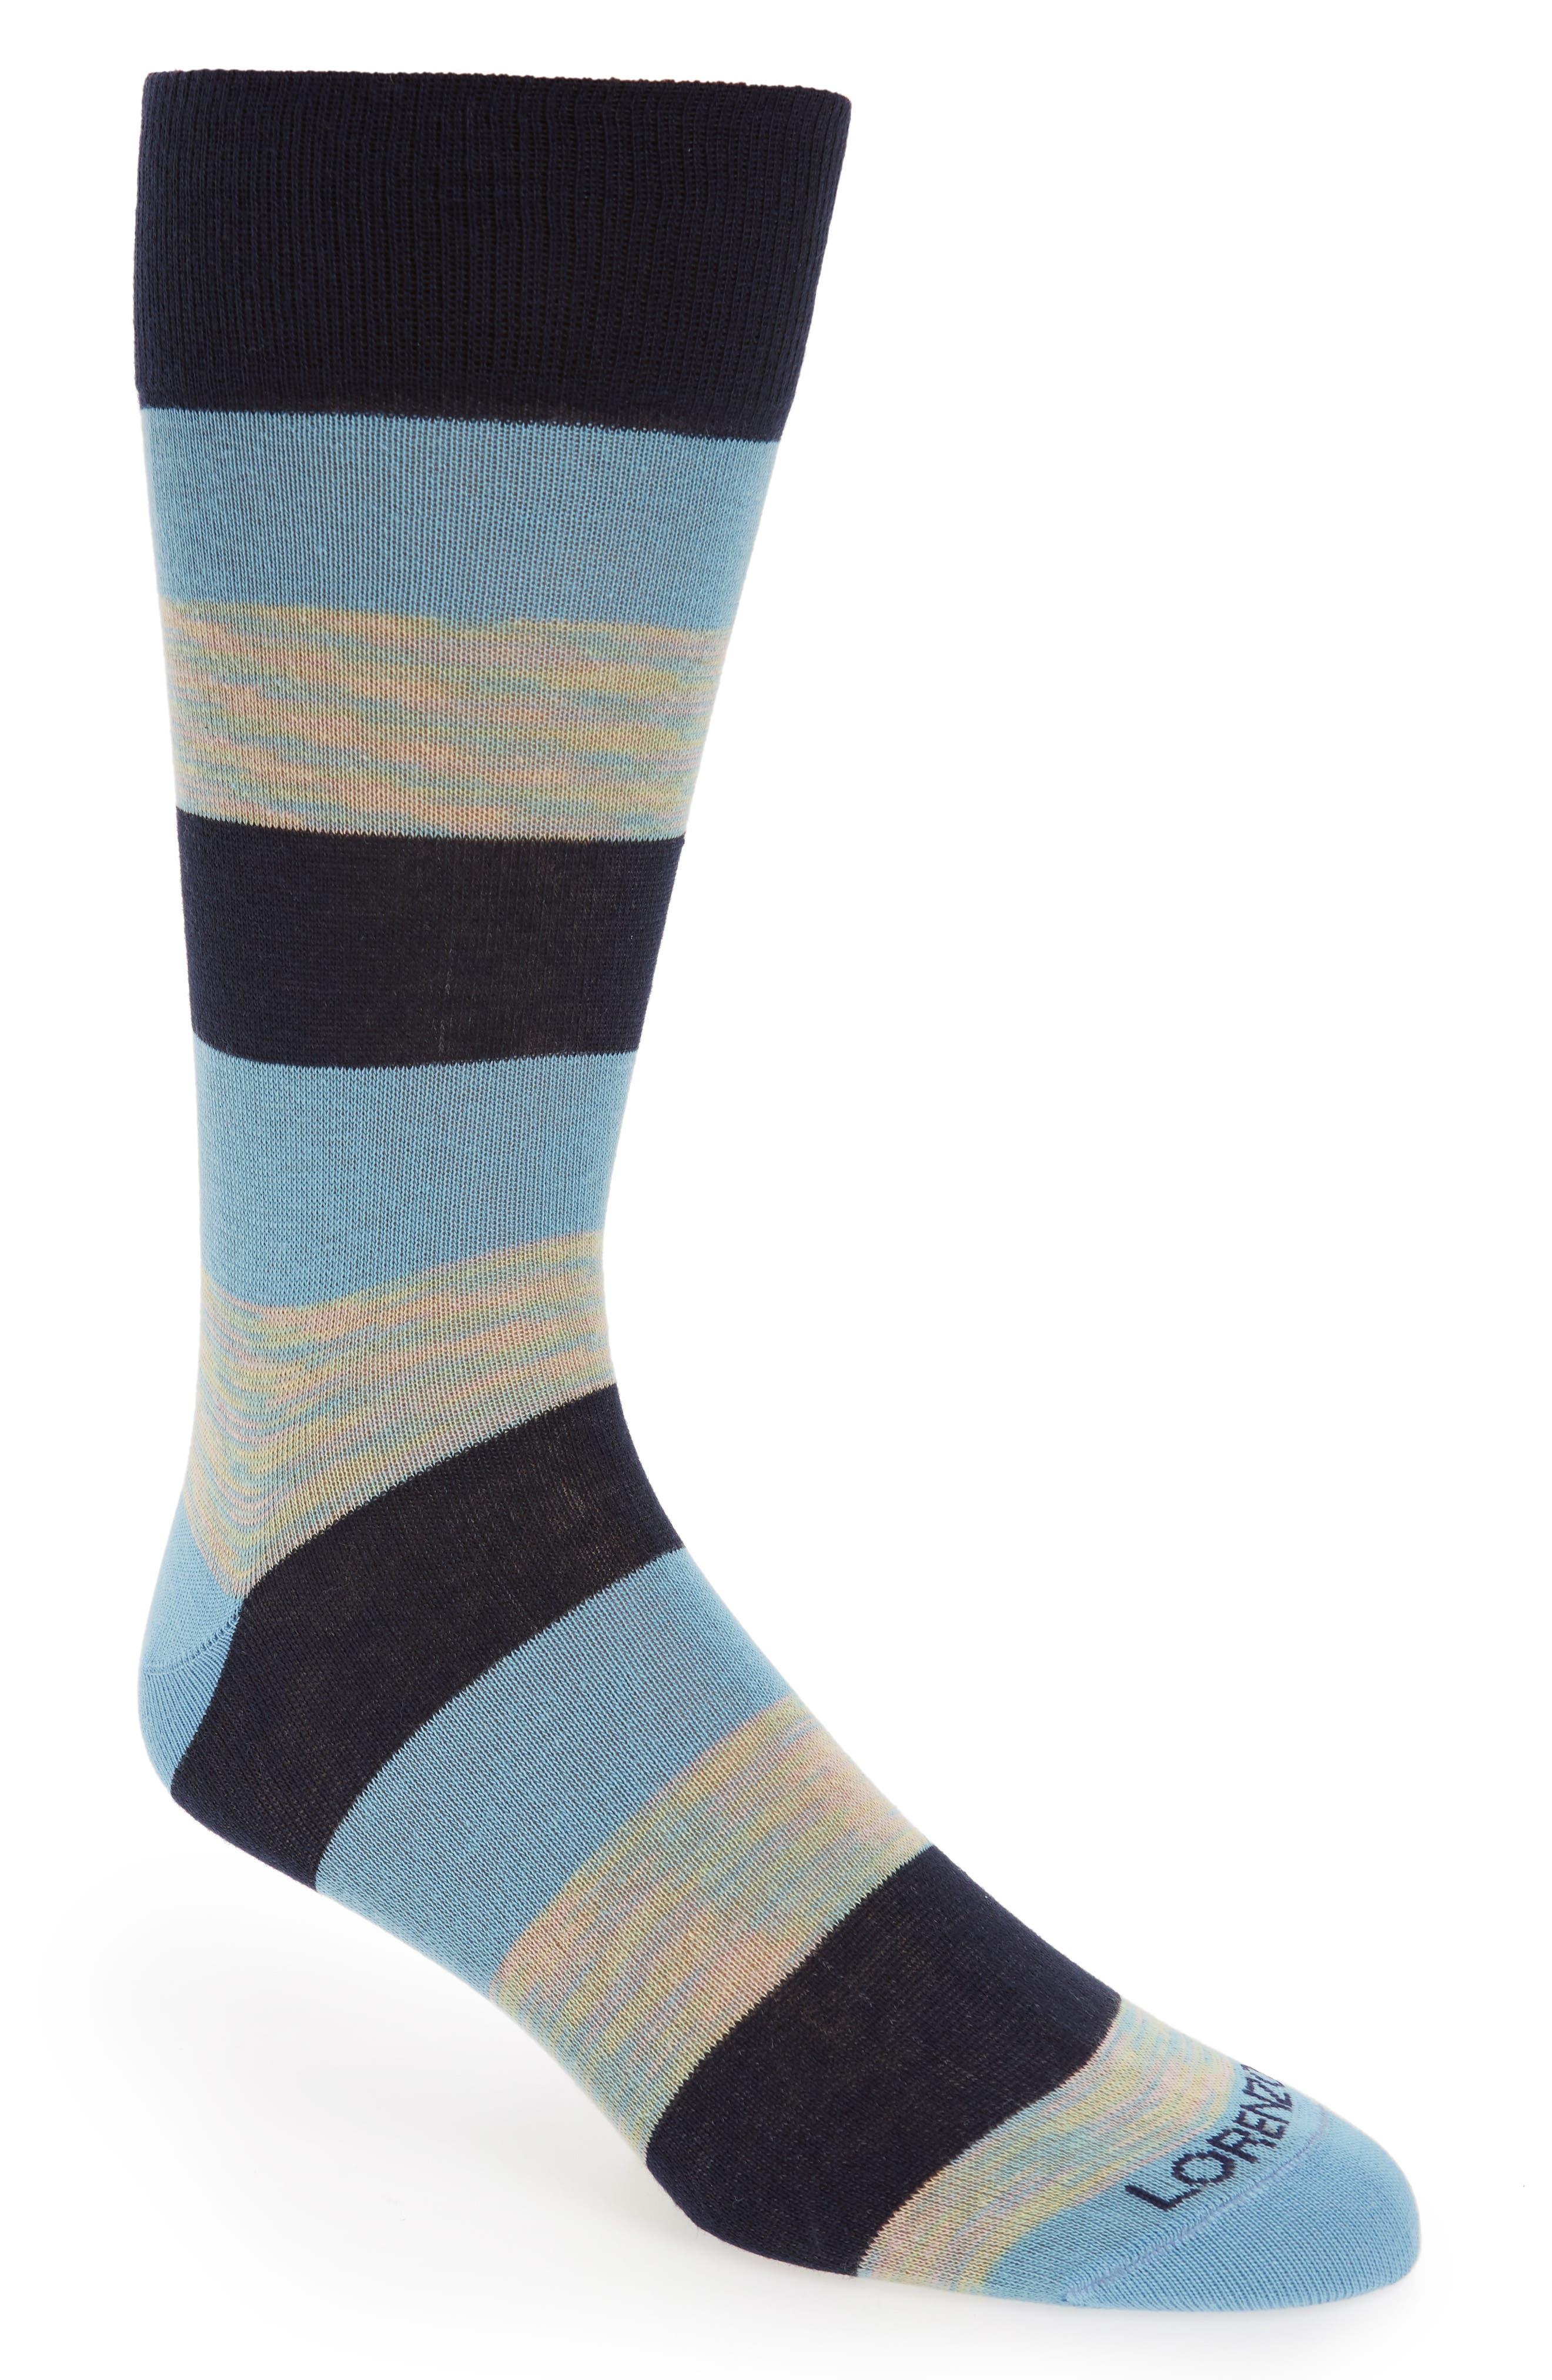 Rugby Stripe Socks,                         Main,                         color, 450